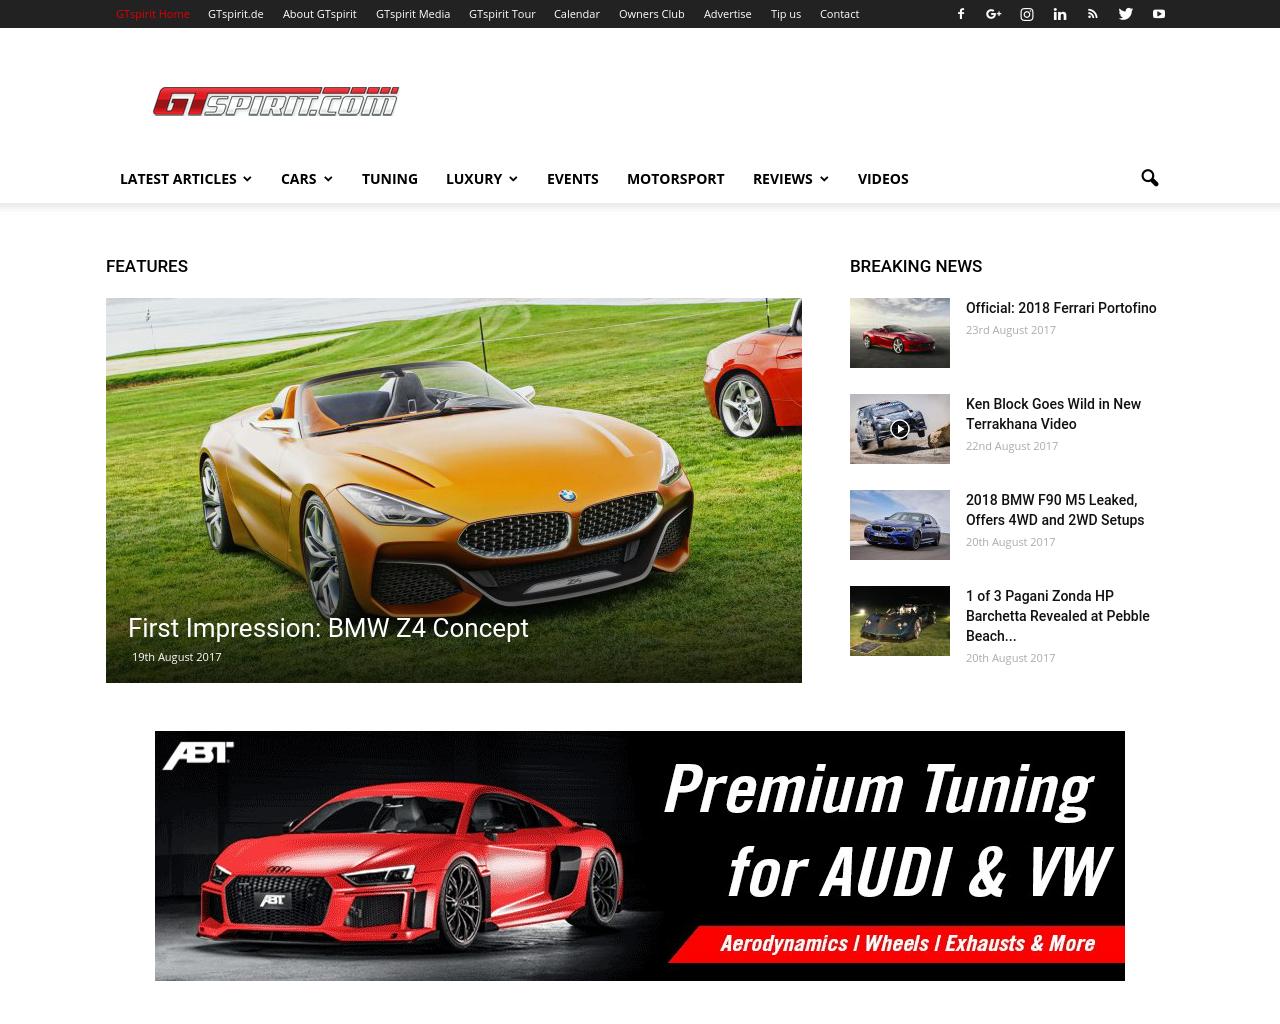 GTSpirit.com-Advertising-Reviews-Pricing